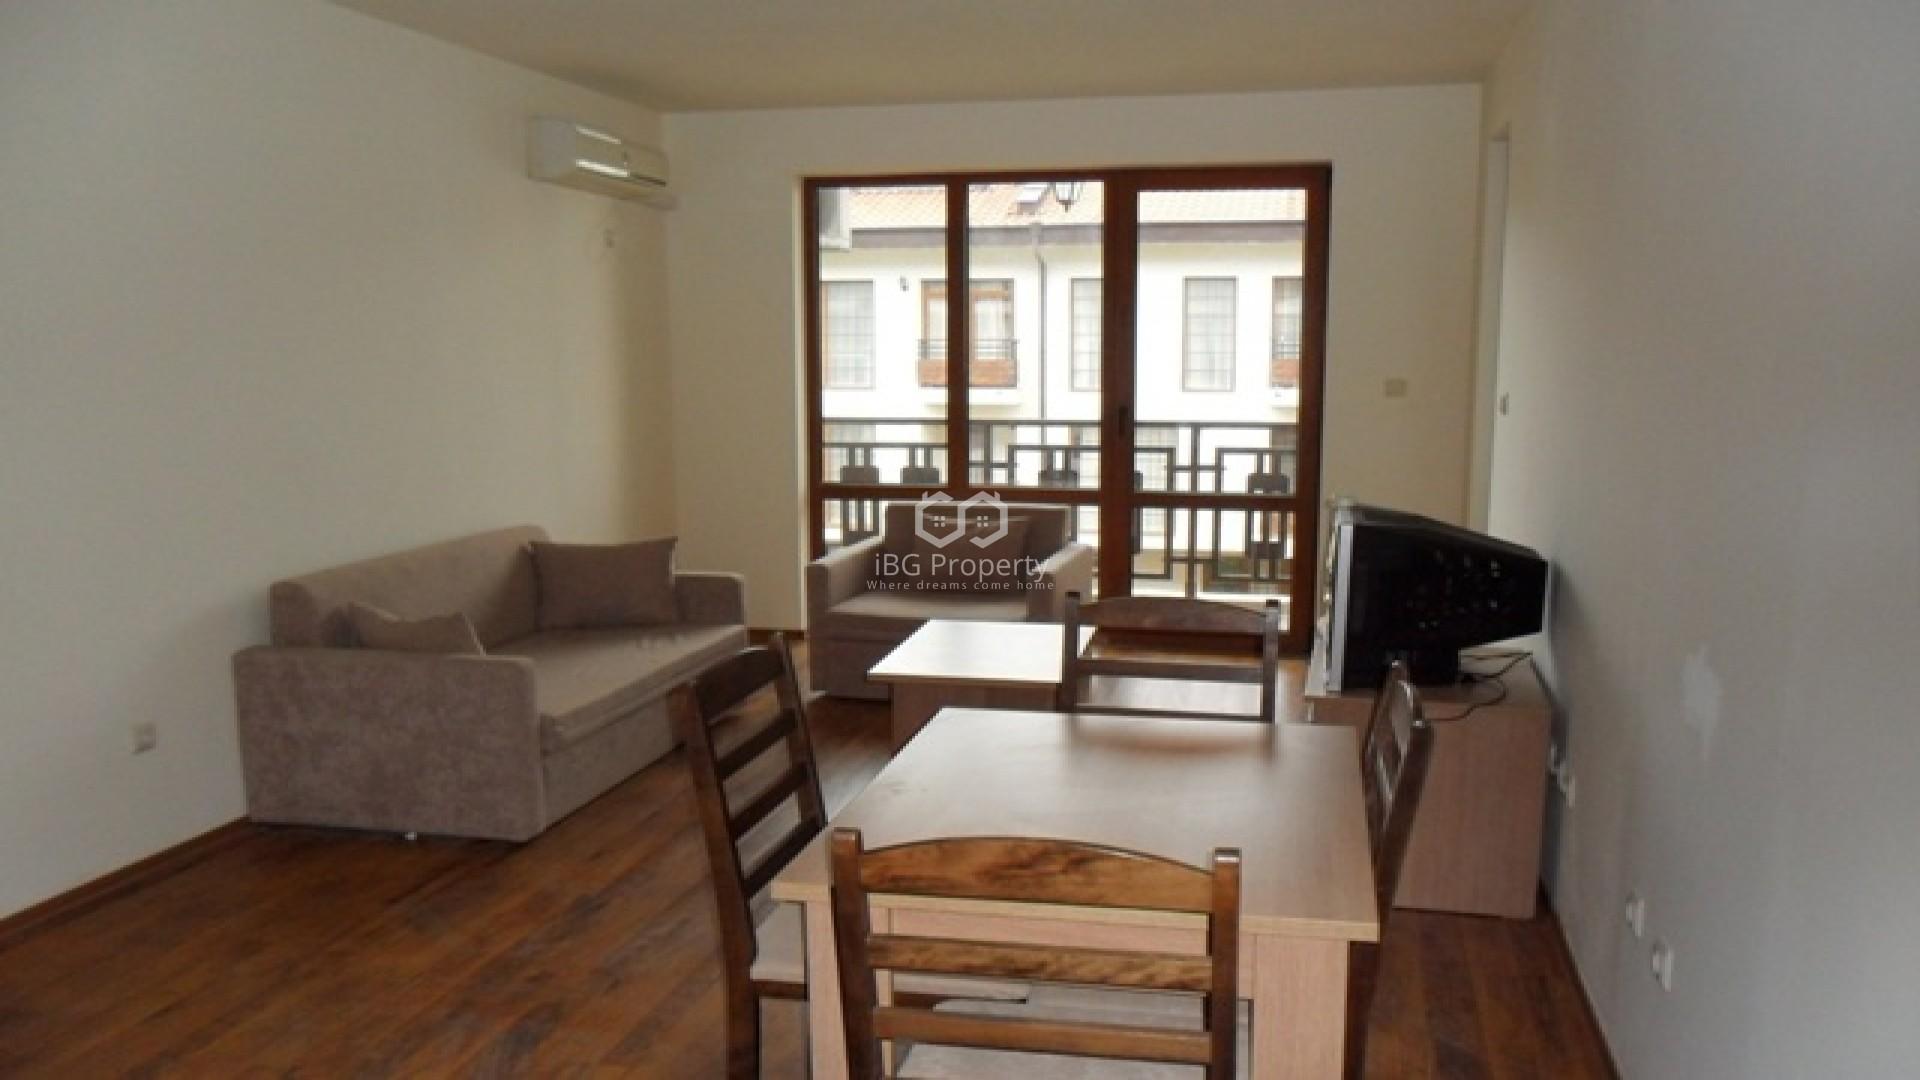 Двухкомнатная квартира Свети Влас 68 m2